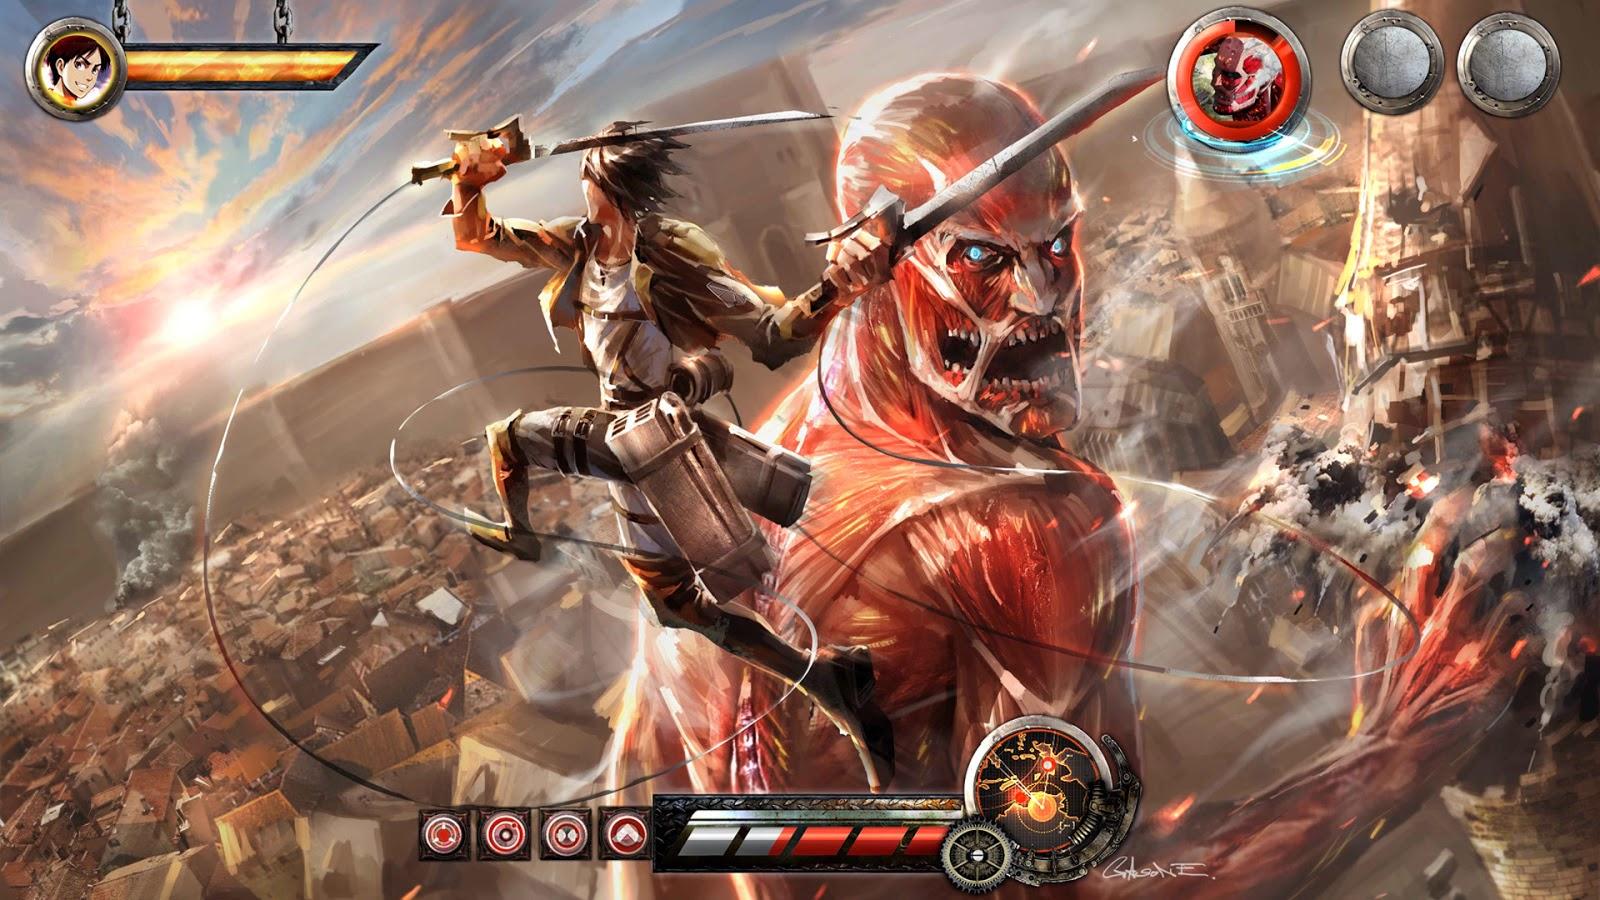 Free Download Eren Vs Colossal Titan Video Game Attack On Titan